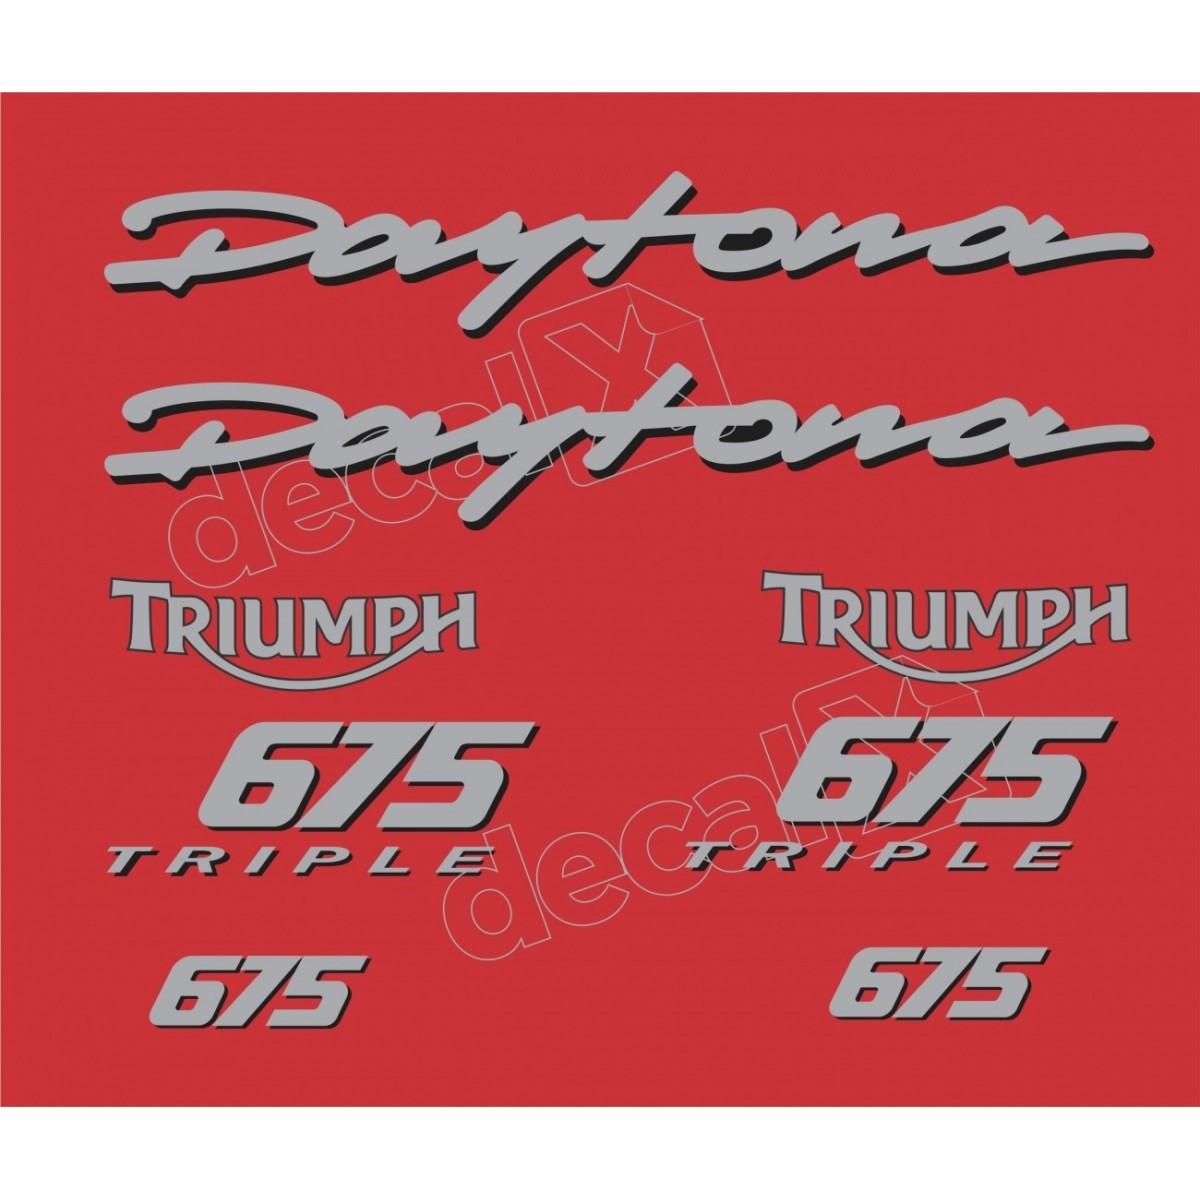 Kit Adesivos Triumph Daytona 675 Vermelha E Prata Decalx